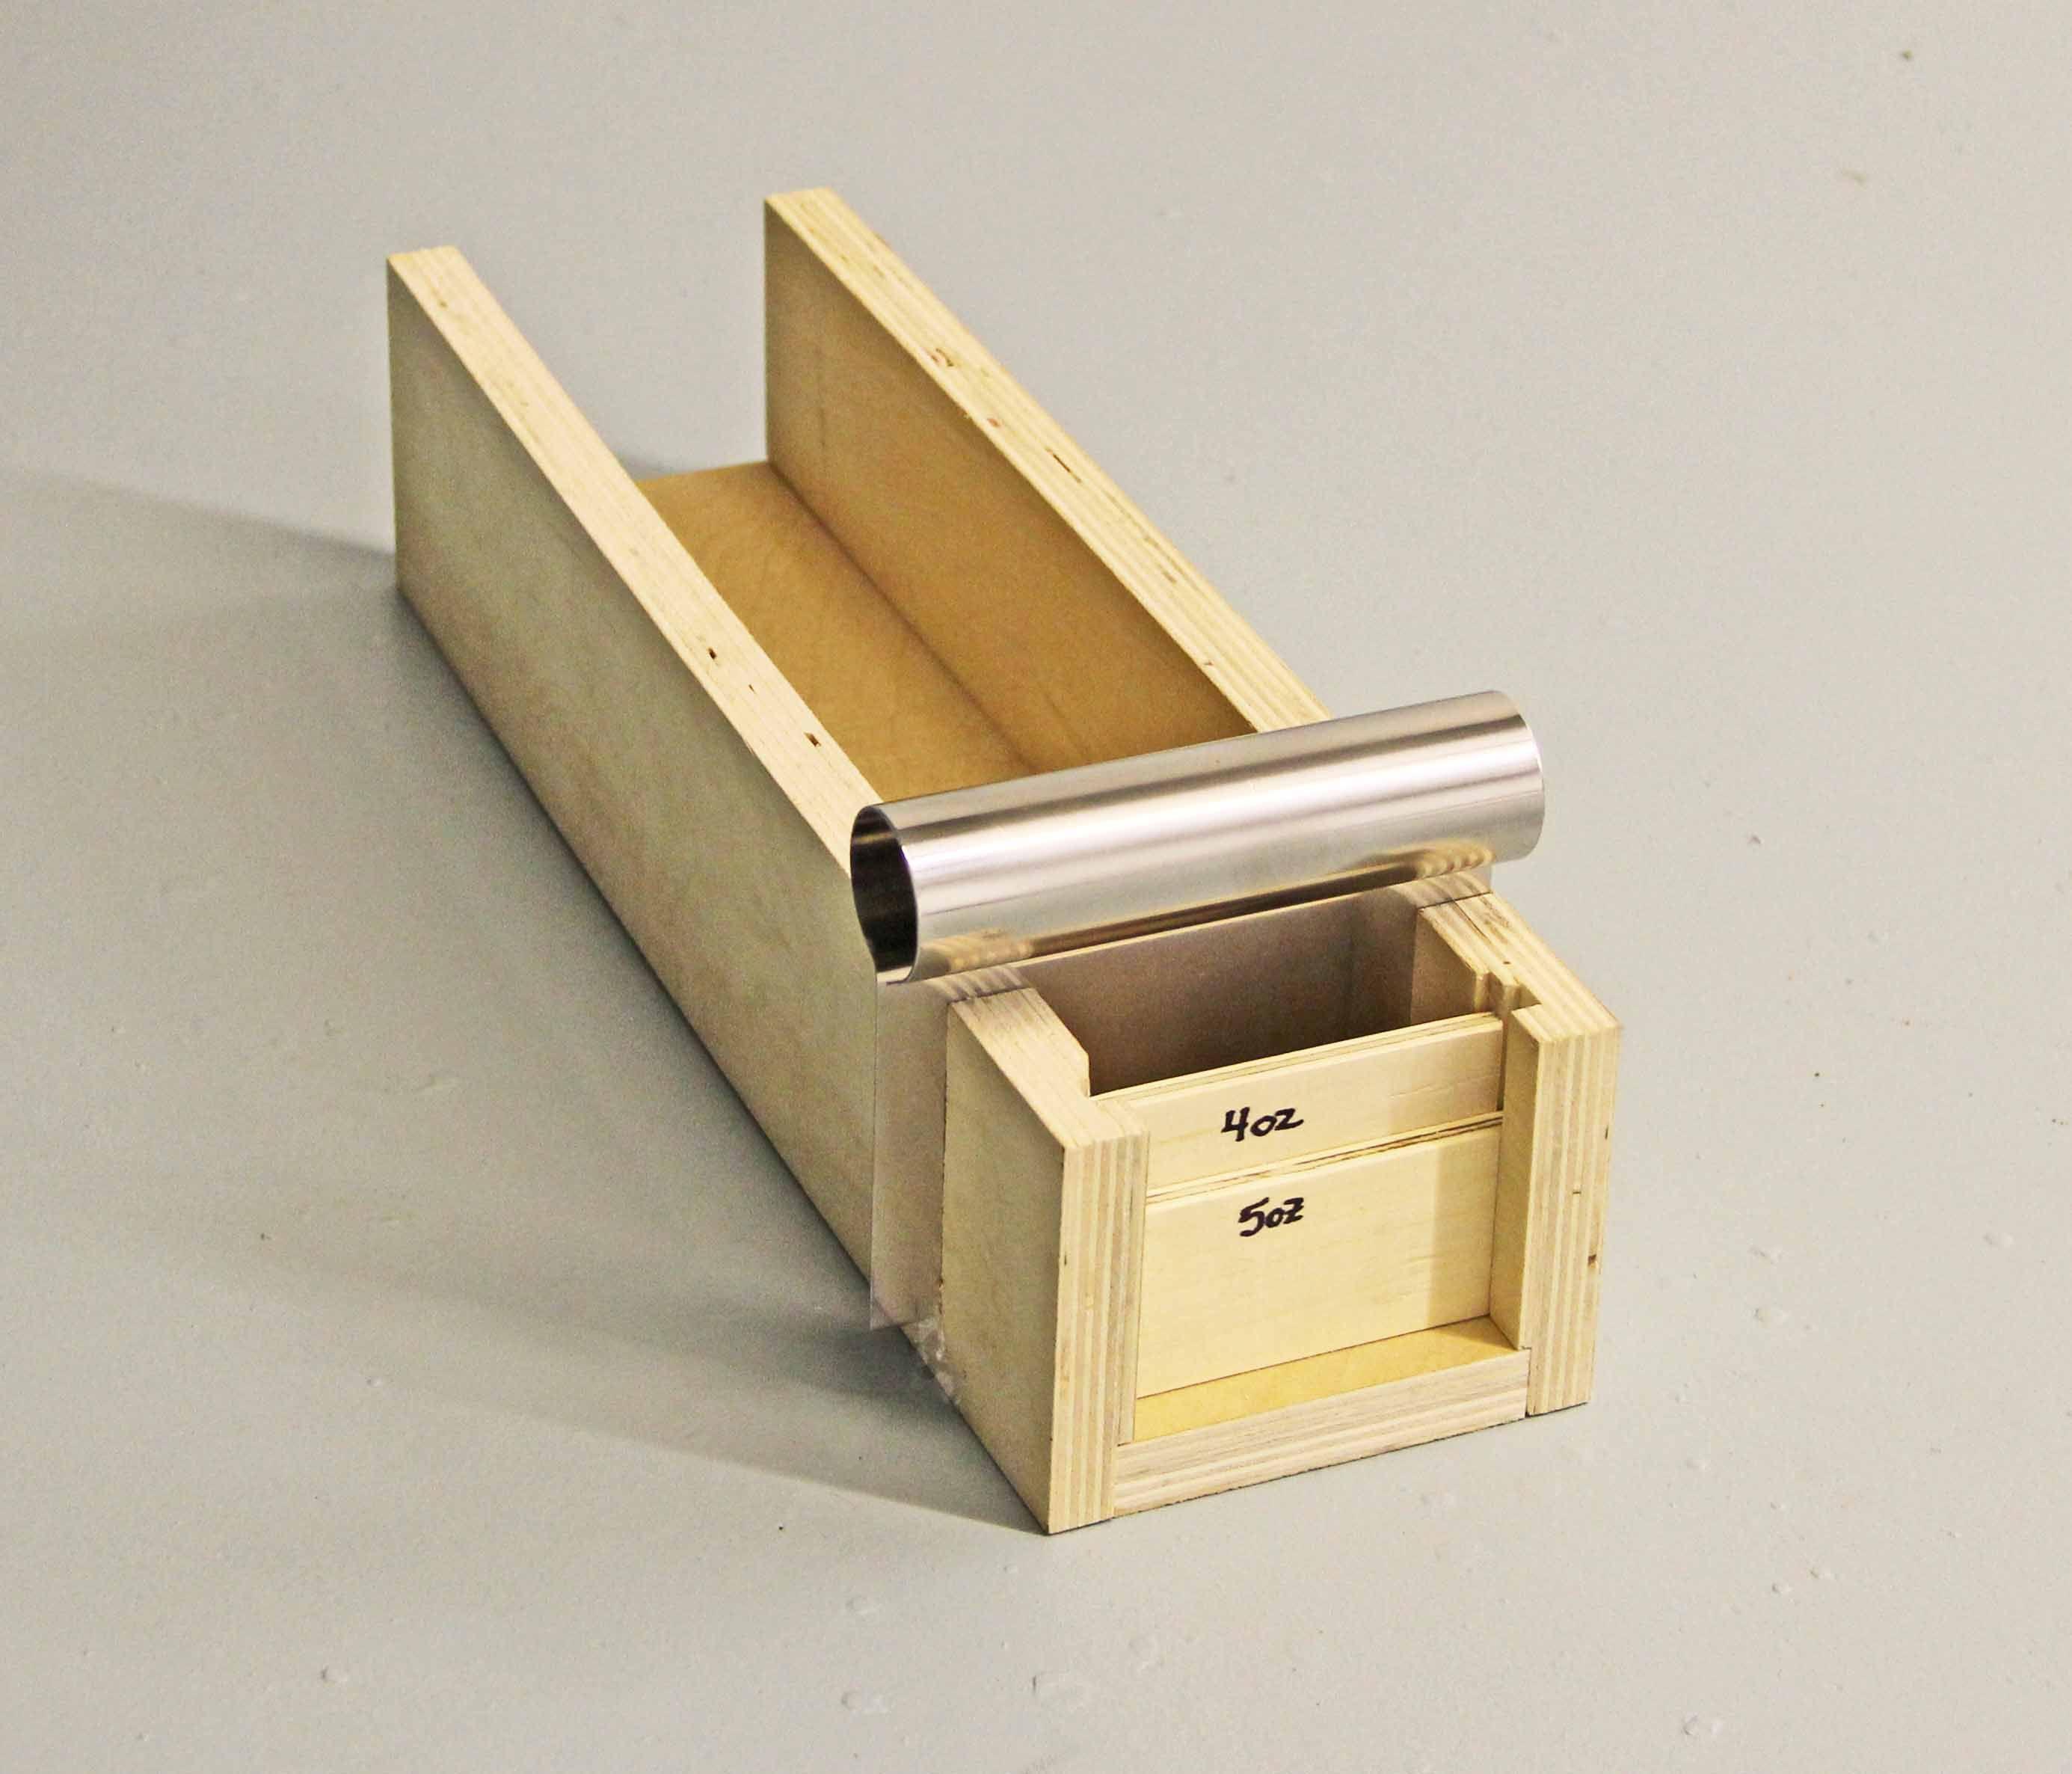 Baltic birch plywood 3 4